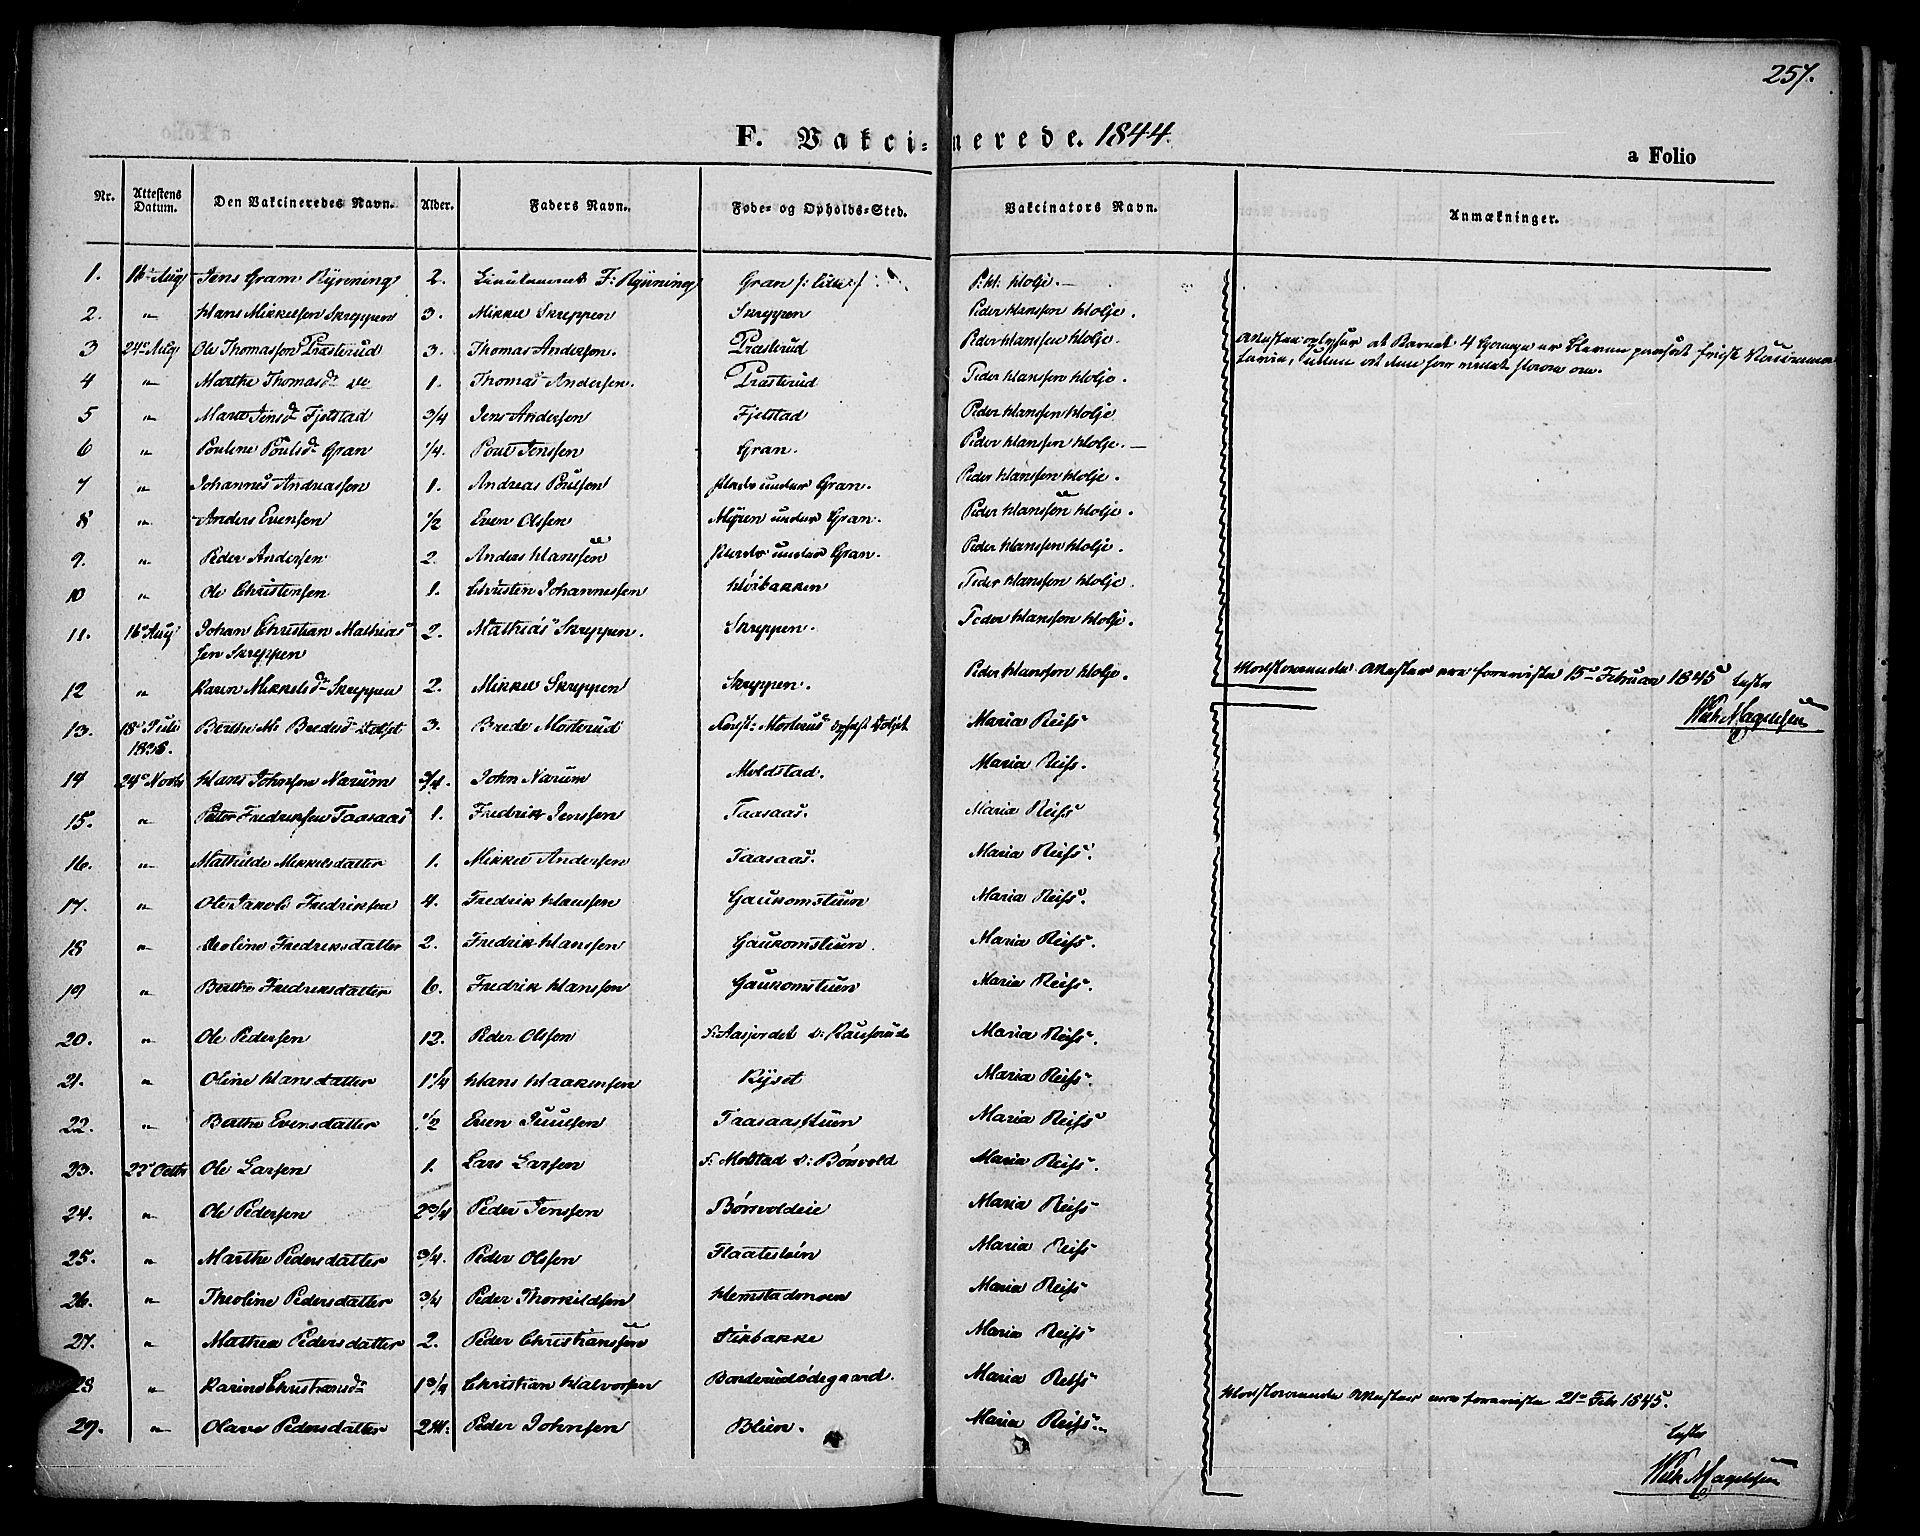 SAH, Vestre Toten prestekontor, H/Ha/Haa/L0004: Ministerialbok nr. 4, 1844-1849, s. 257